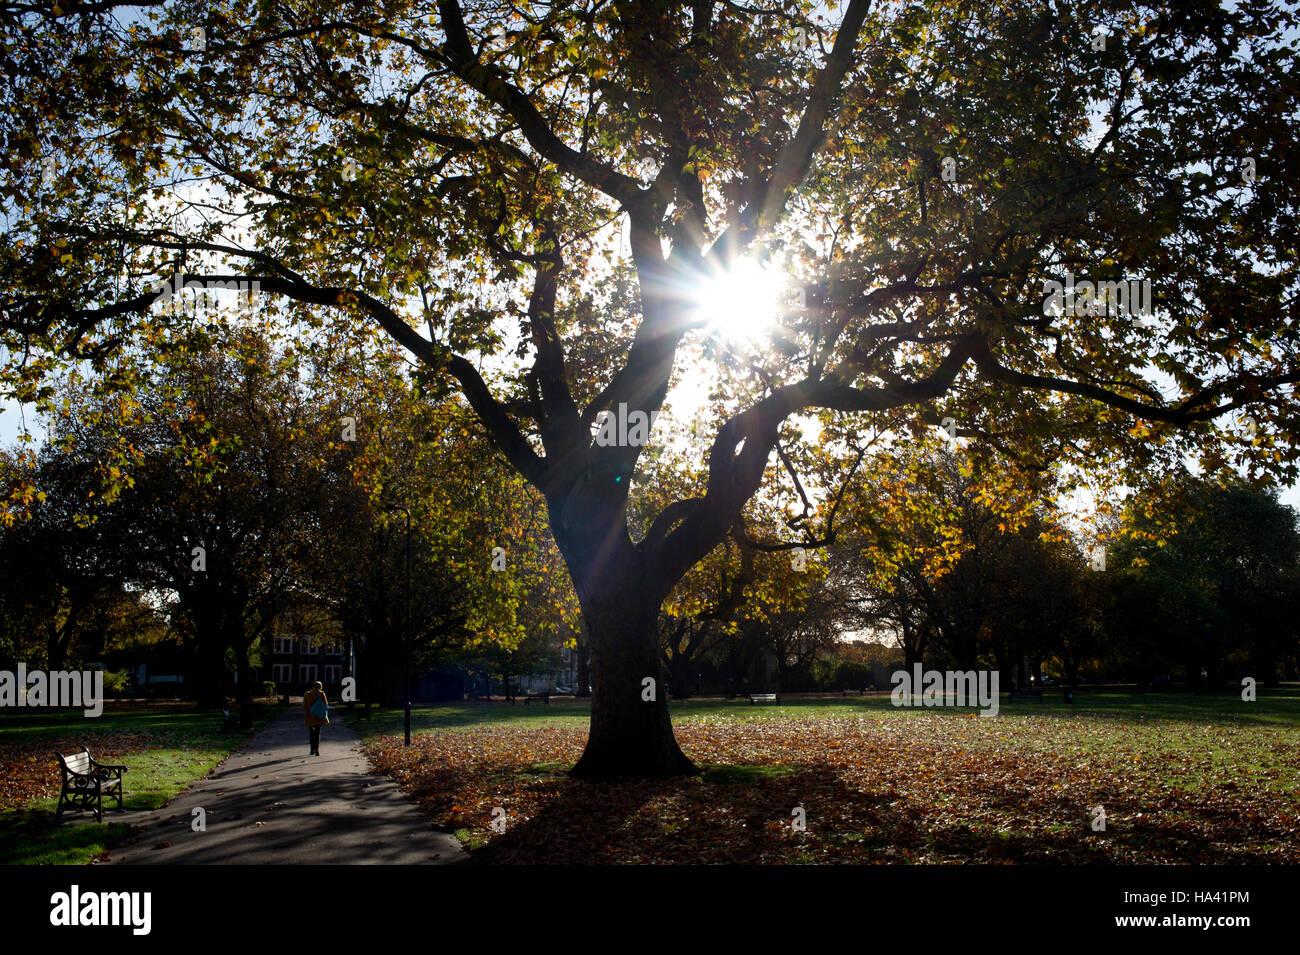 Hackney. London Fields. Sun bursting through tree with fallen leaves - Stock Image